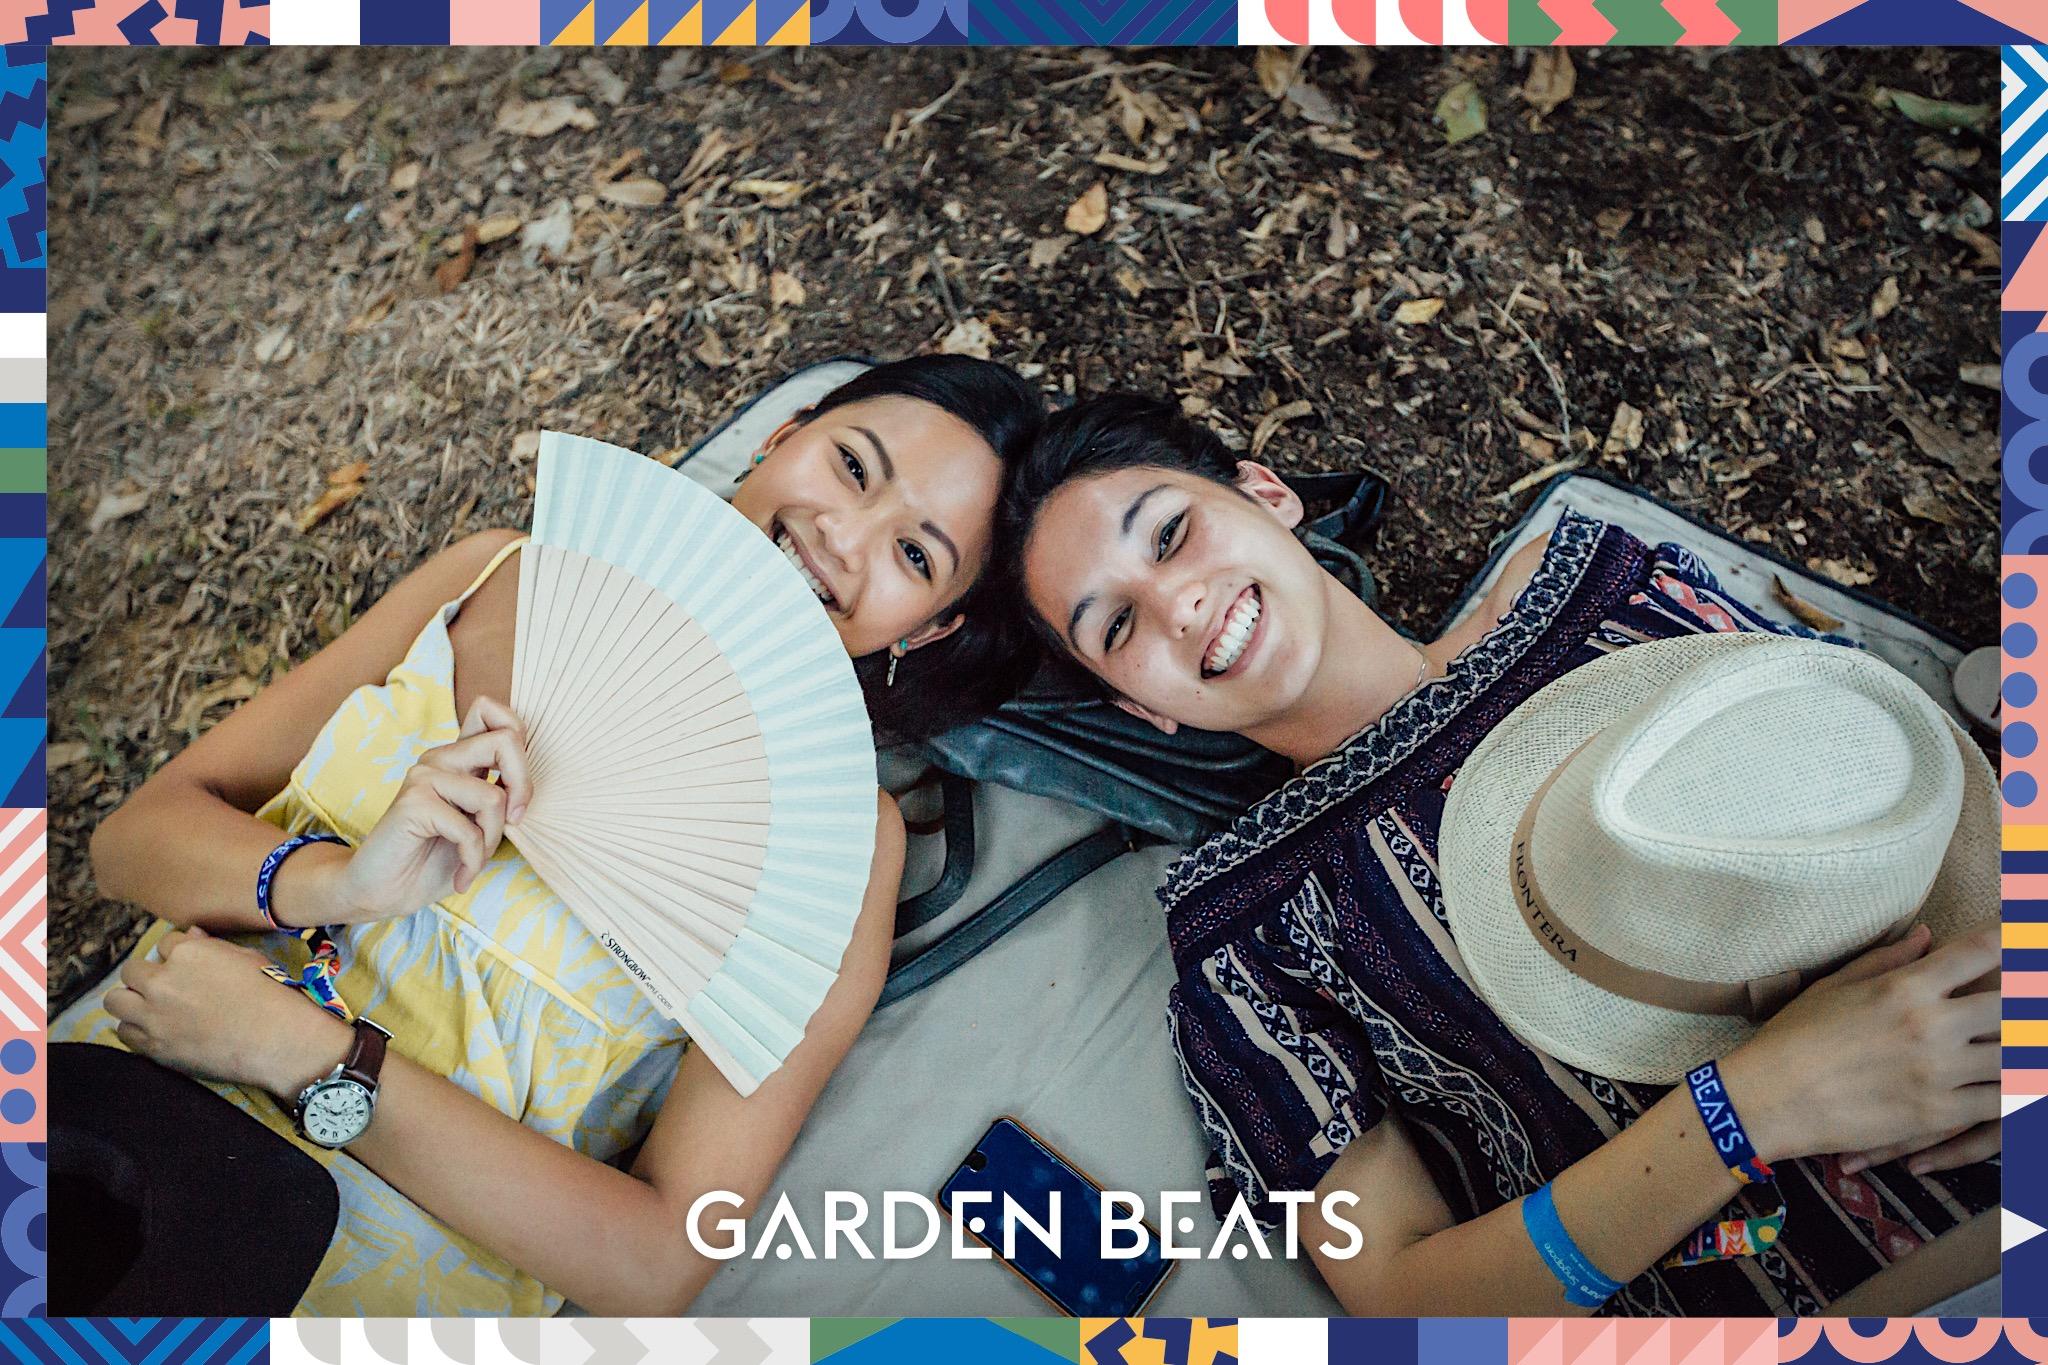 18032017_GardenBeats_Colossal697_WatermarkedGB.jpg